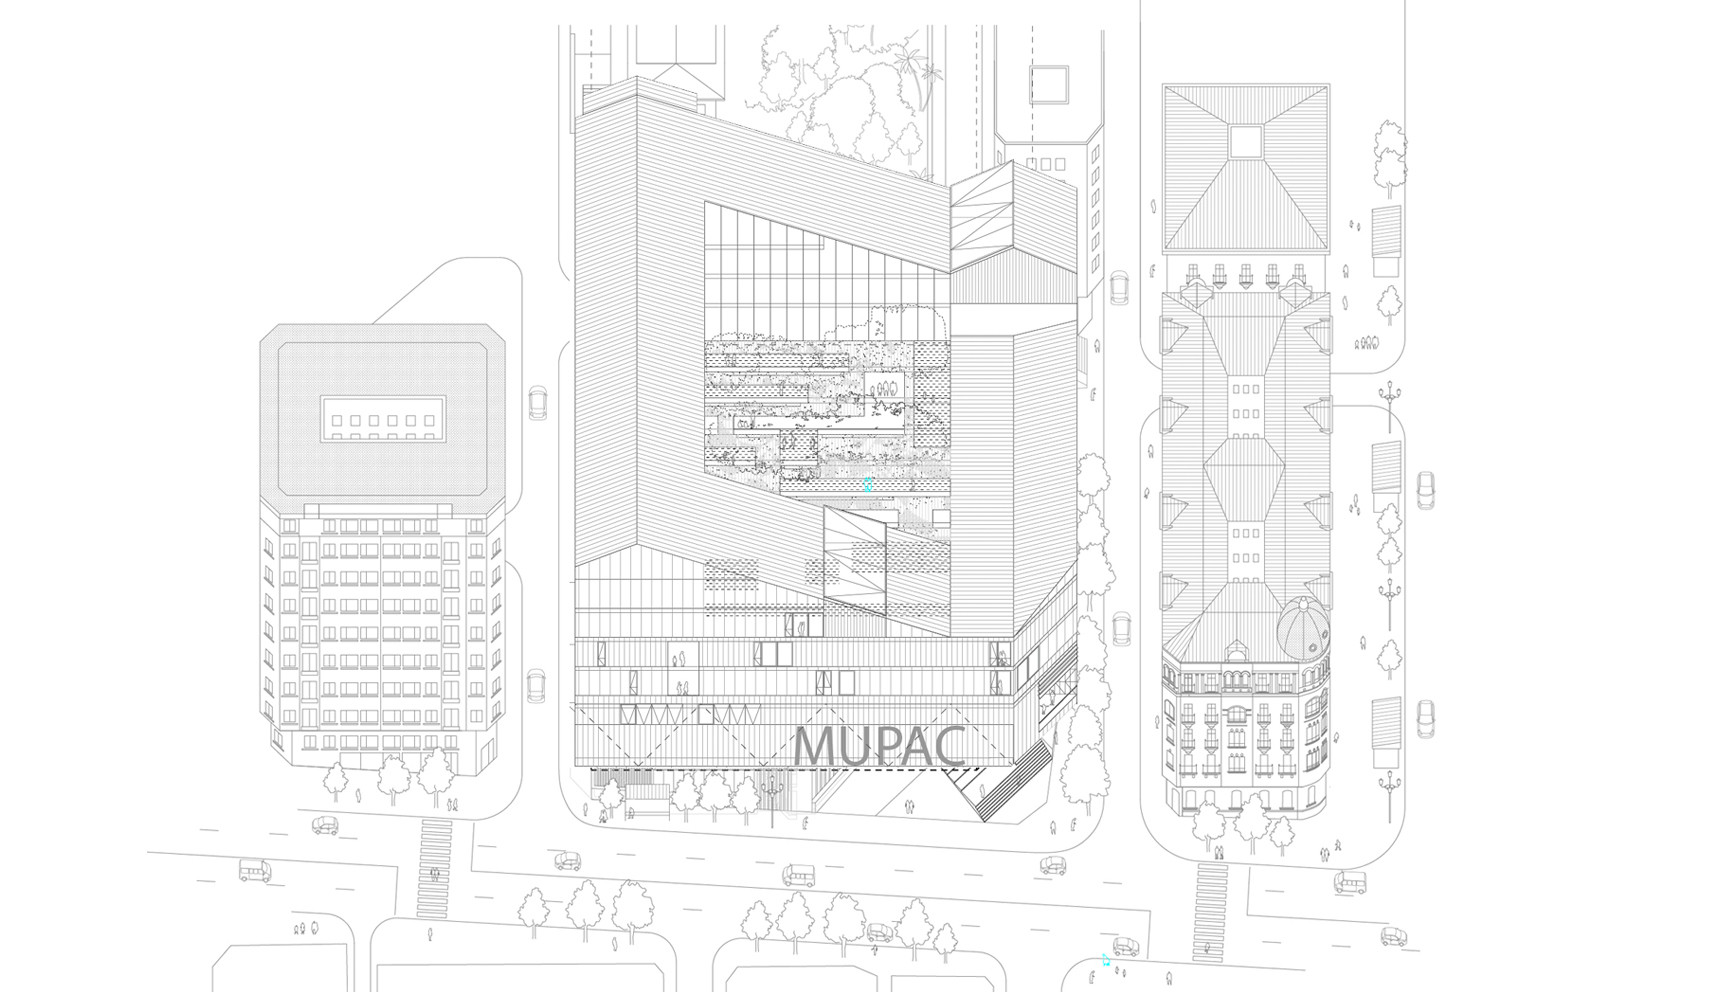 mupac 1.jpg